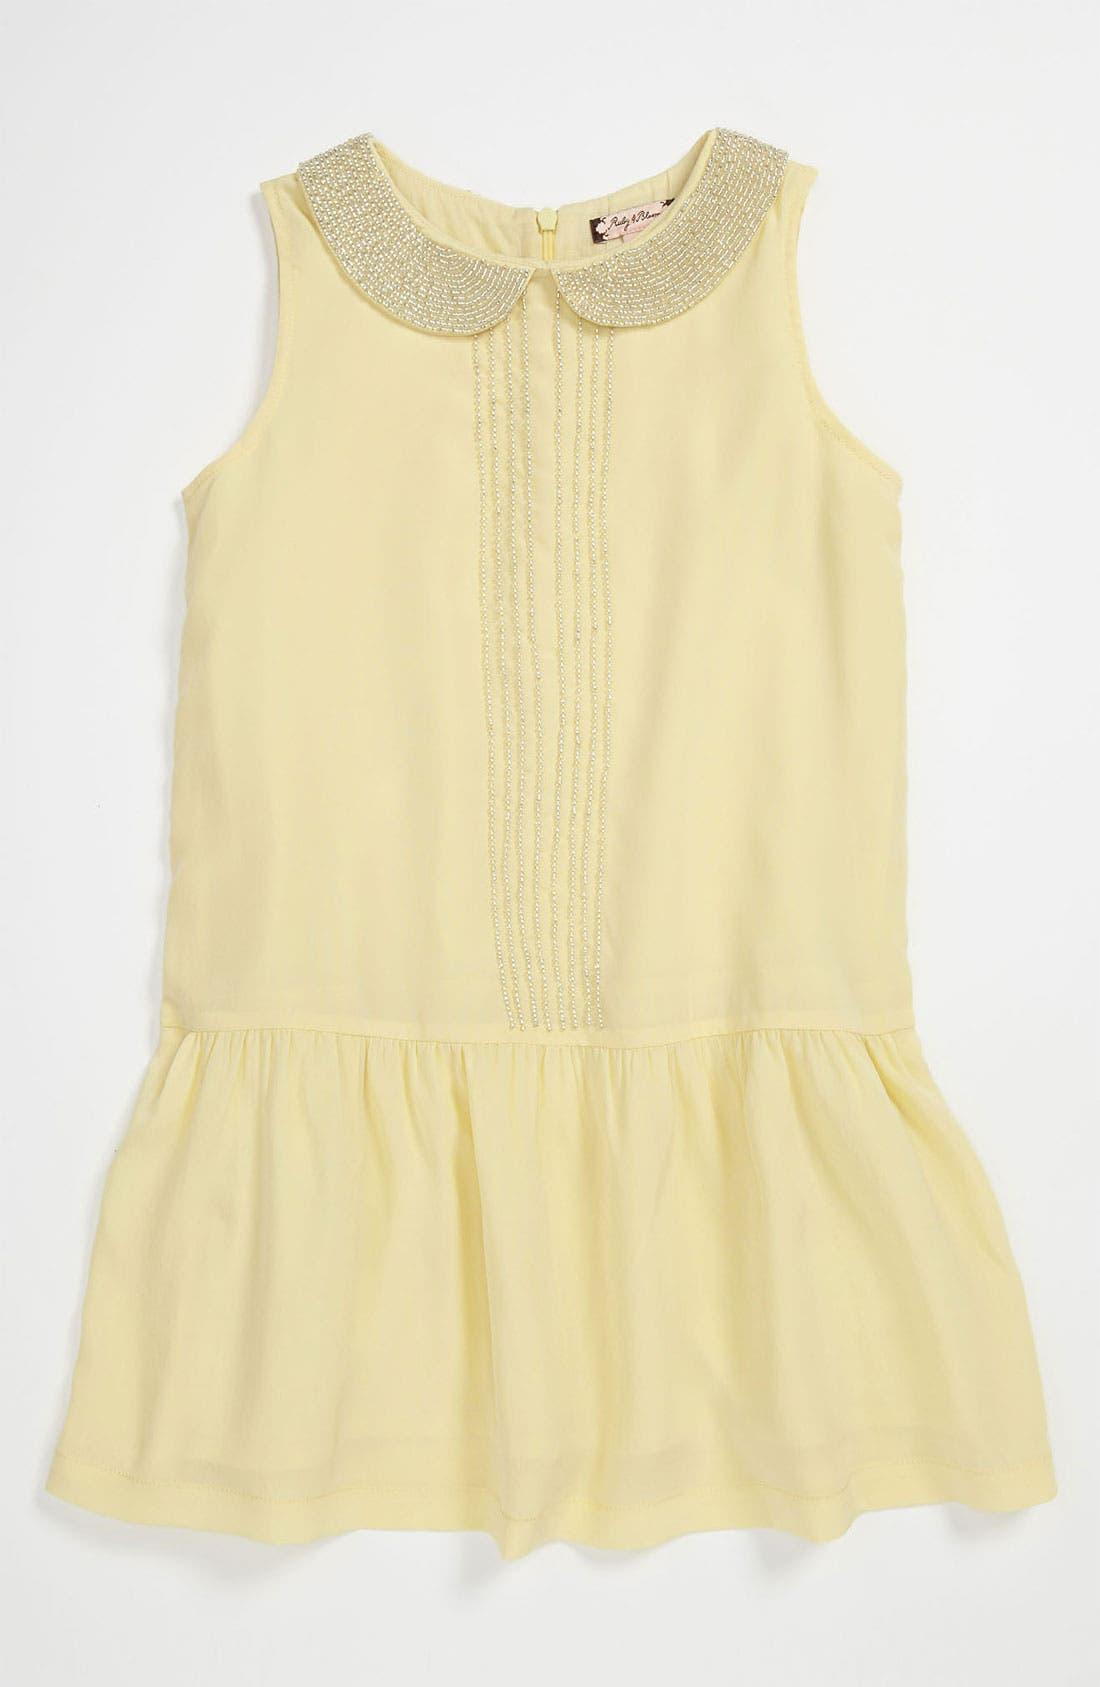 Alternate Image 1 Selected - Ruby & Bloom 'Harlow' Dress (Little Girls & Big Girls)